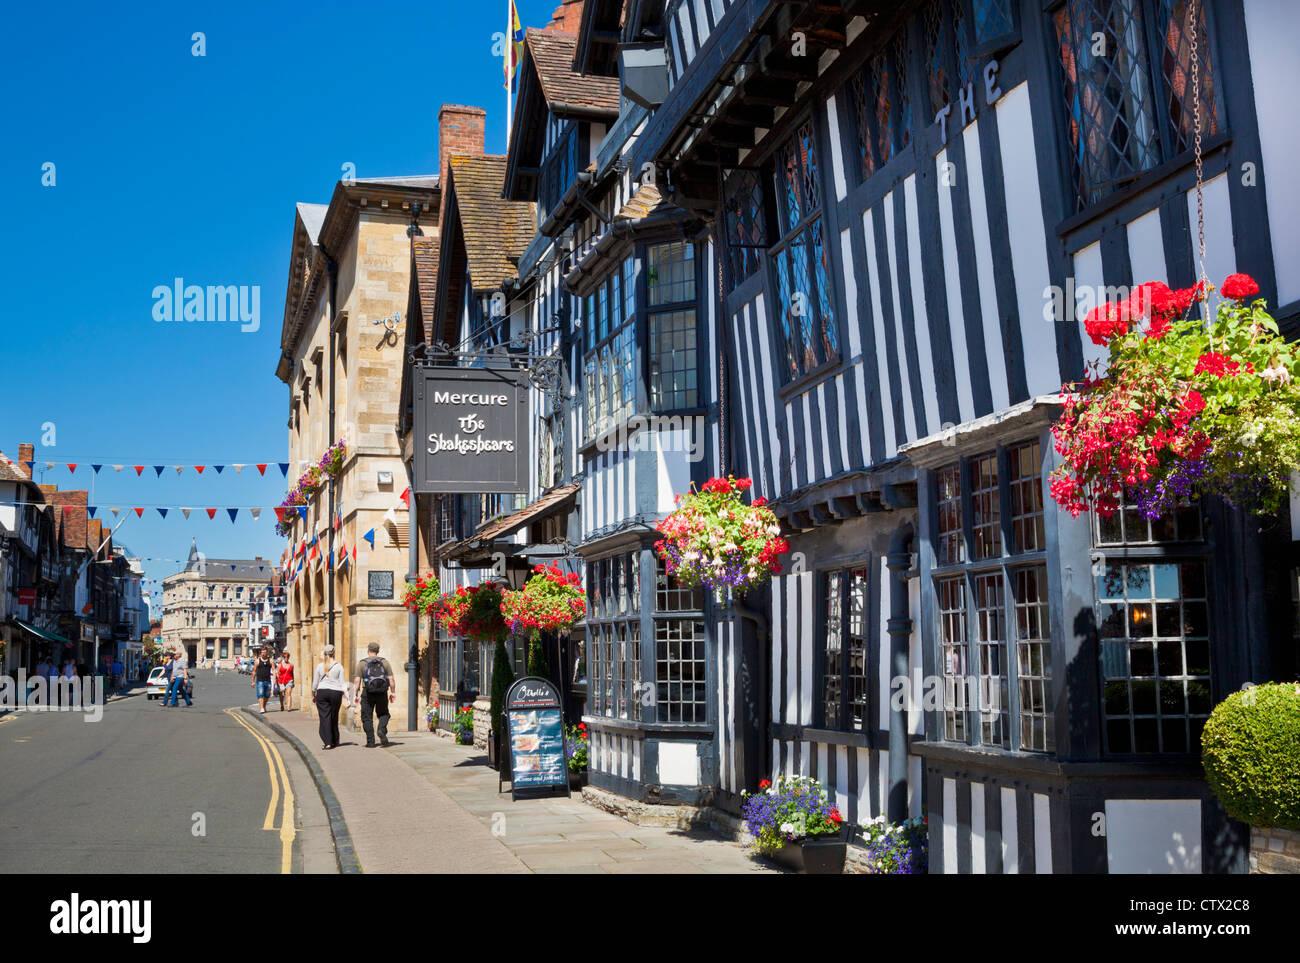 Mercure Shakespeare Hotel Chapel Street Stratford upon Avon Warwickshire England UK GB EU Europe - Stock Image